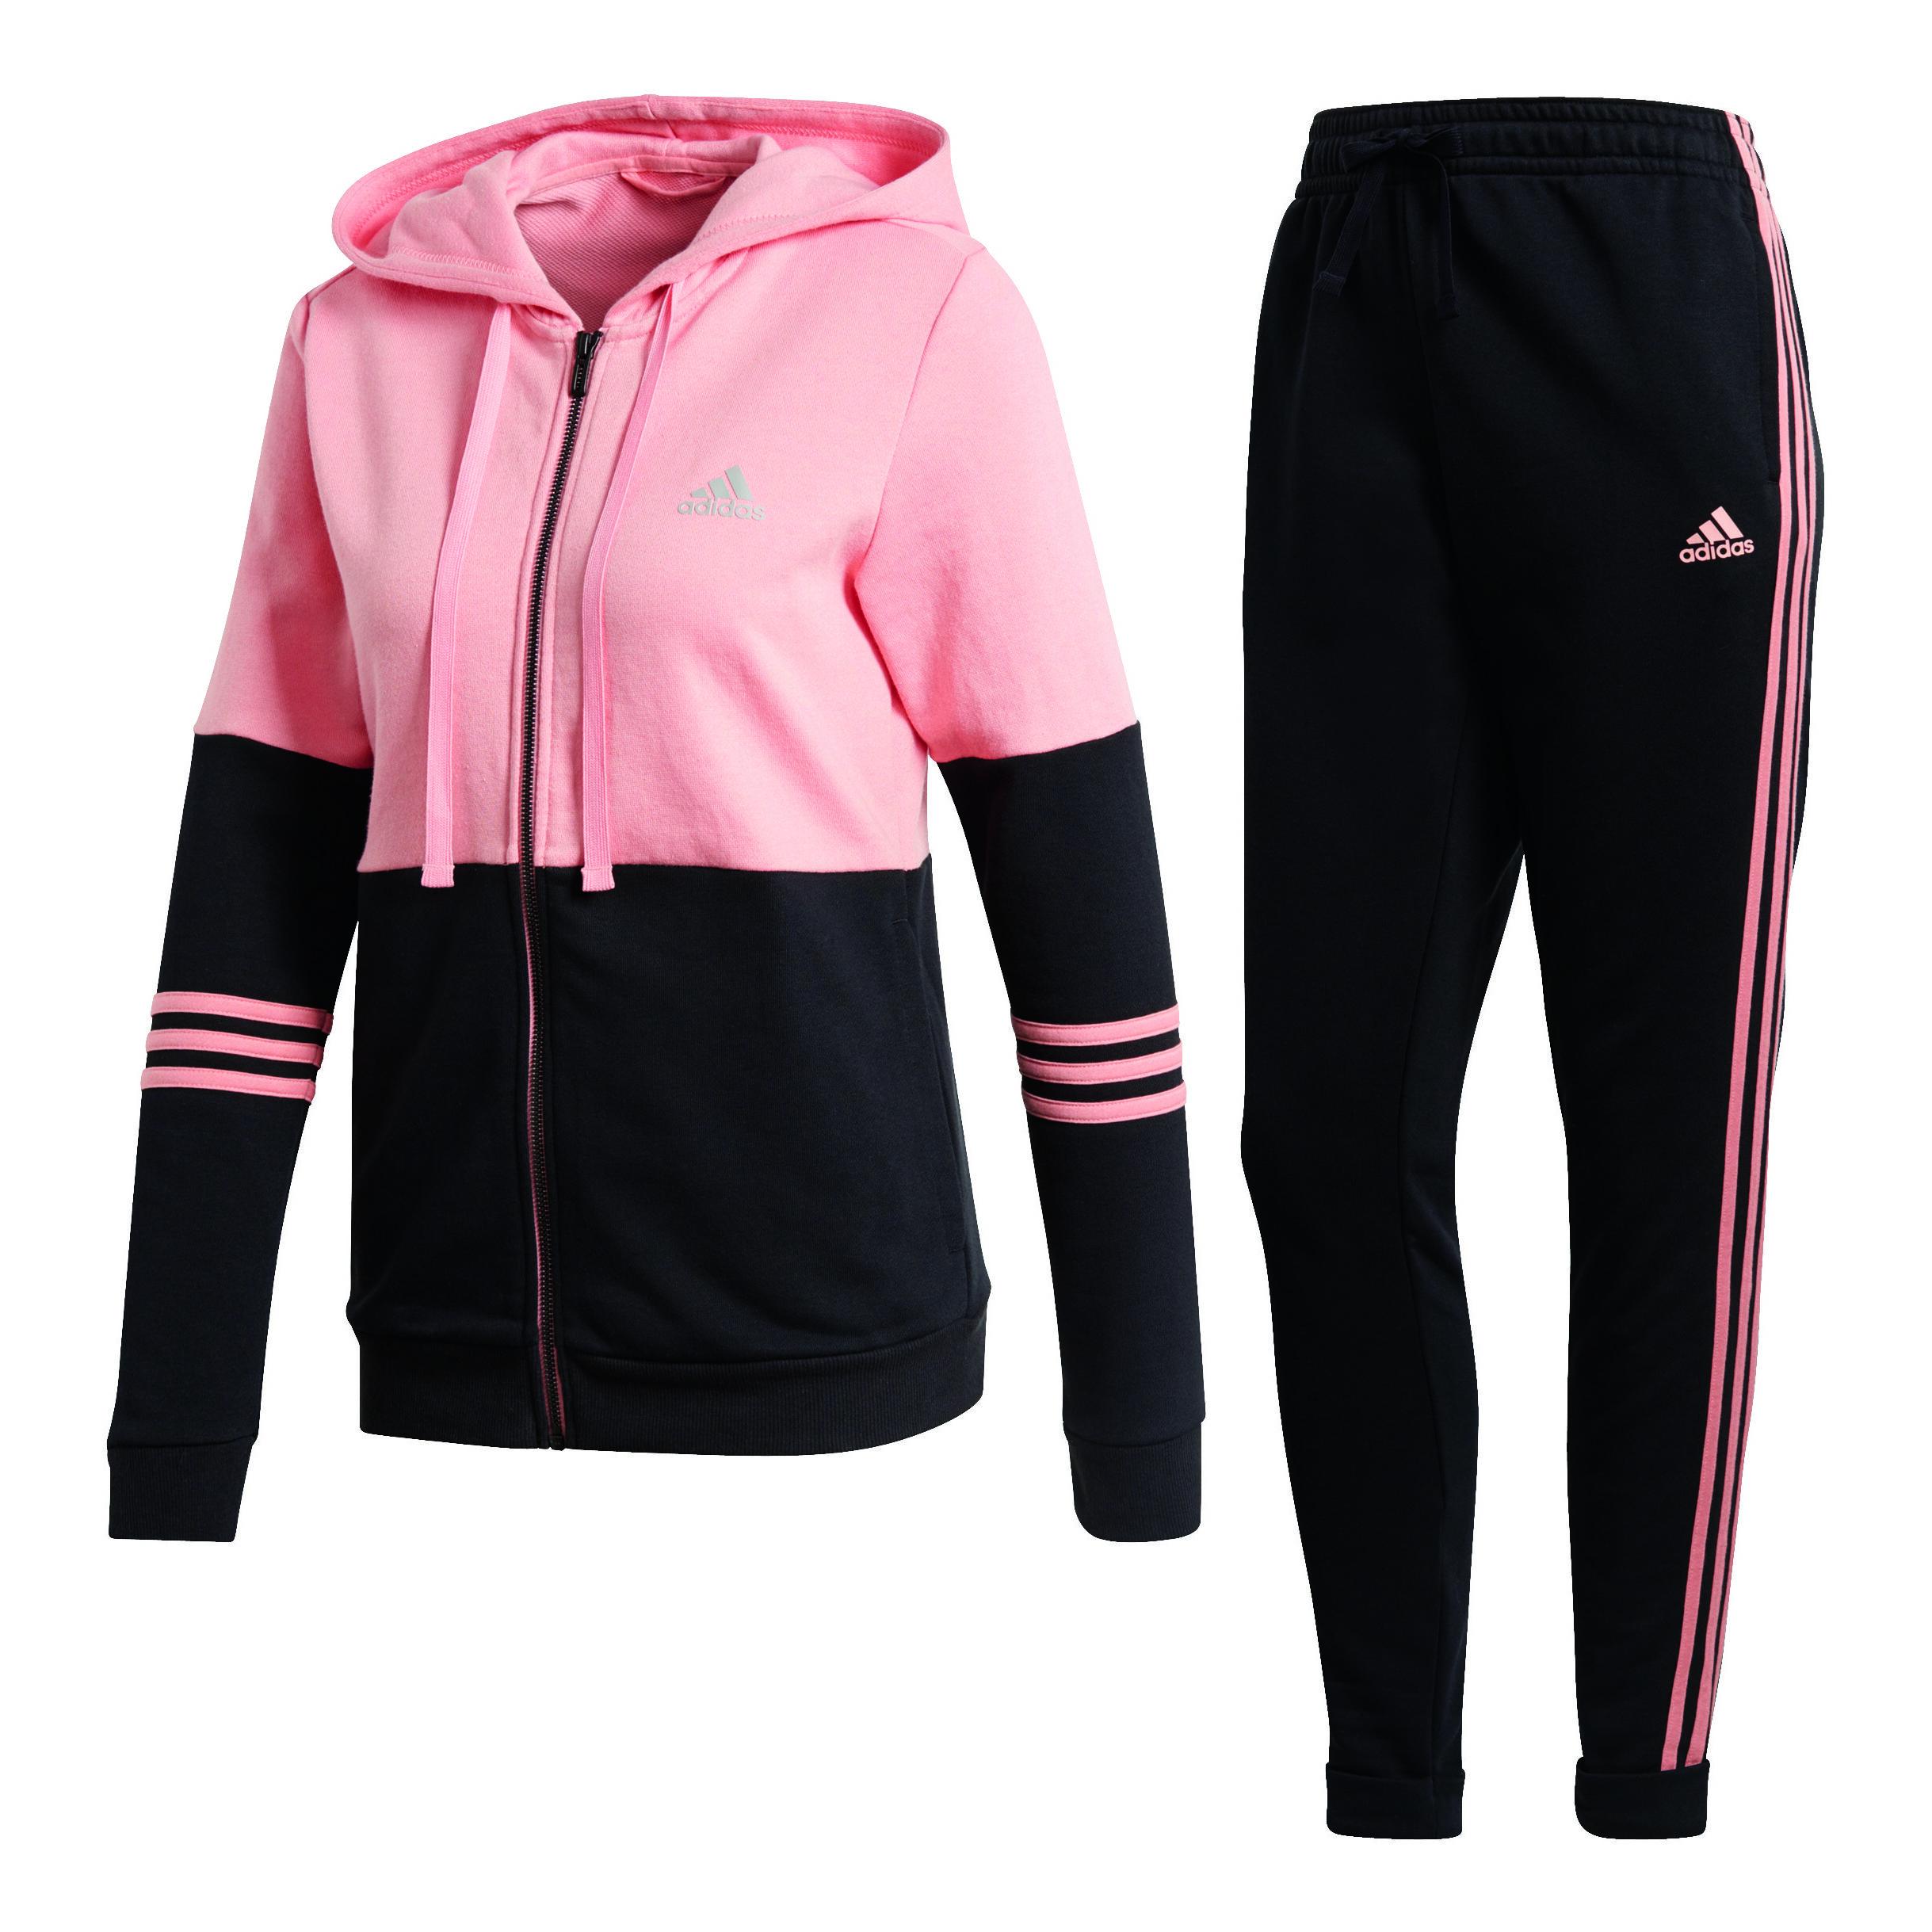 adidas Co Energize Trainingsanzug Damen - Rosa, Schwarz ...